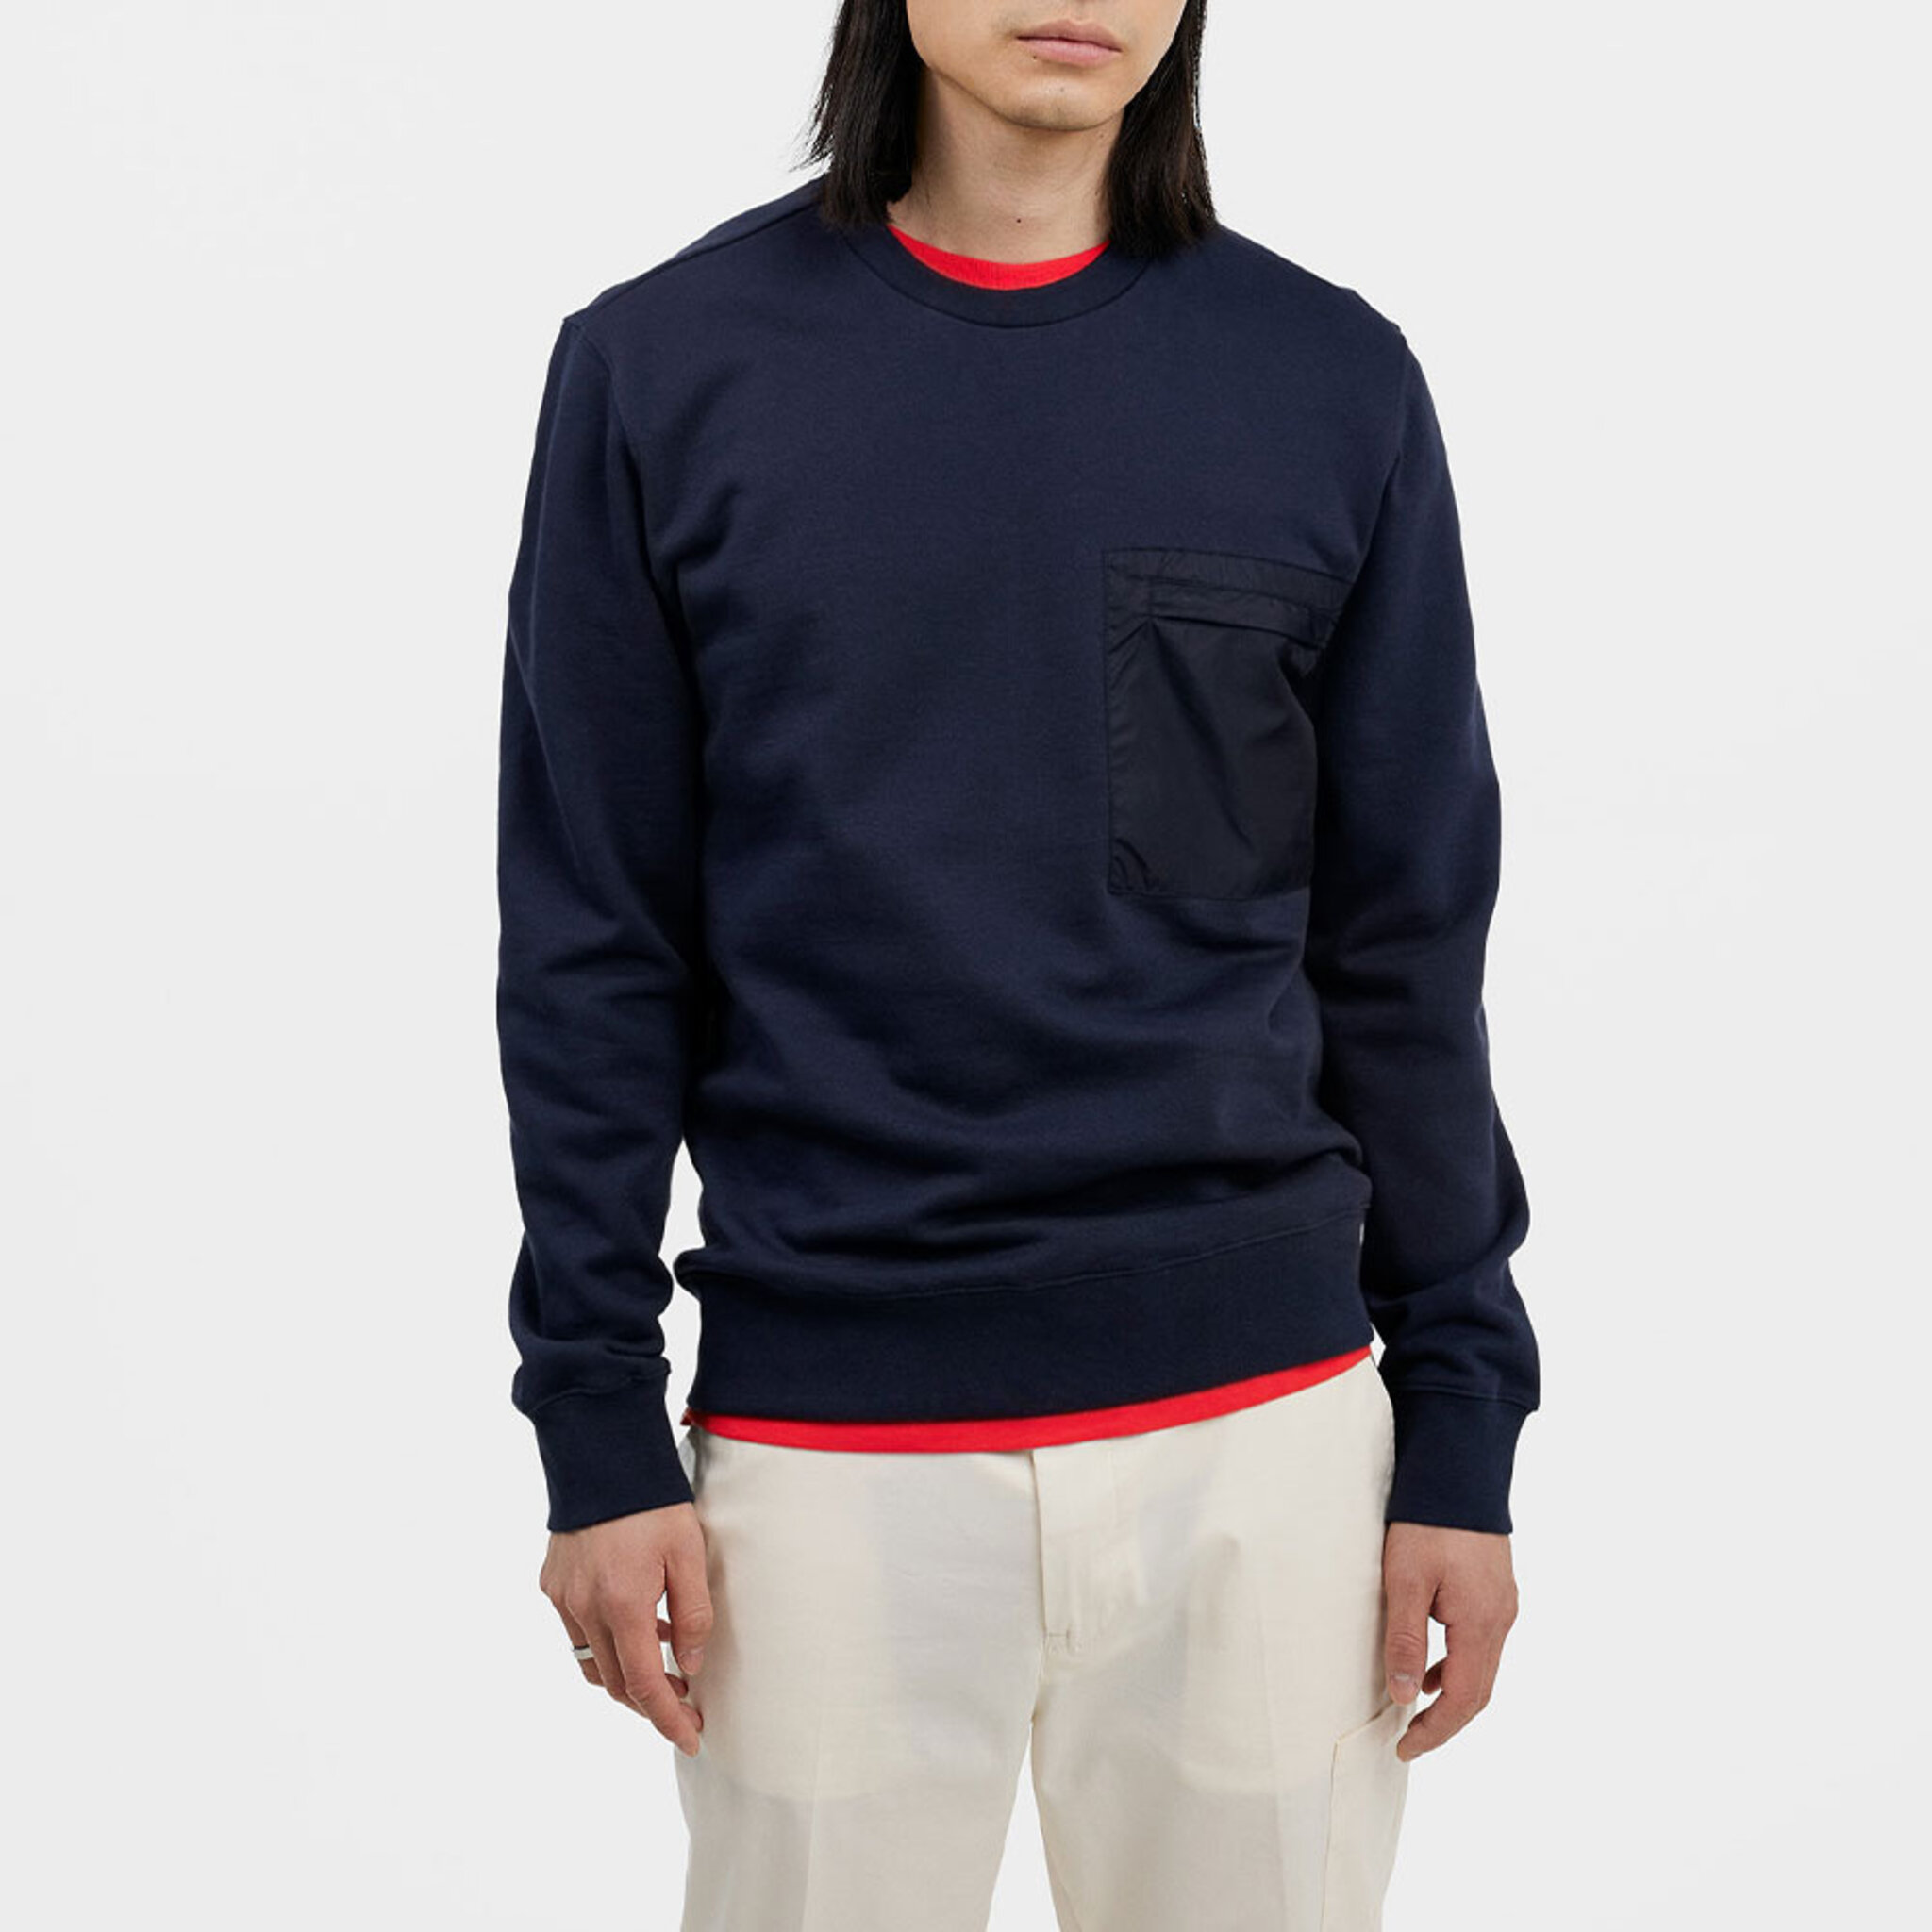 Faron Sweat Chest Pocket Shirt